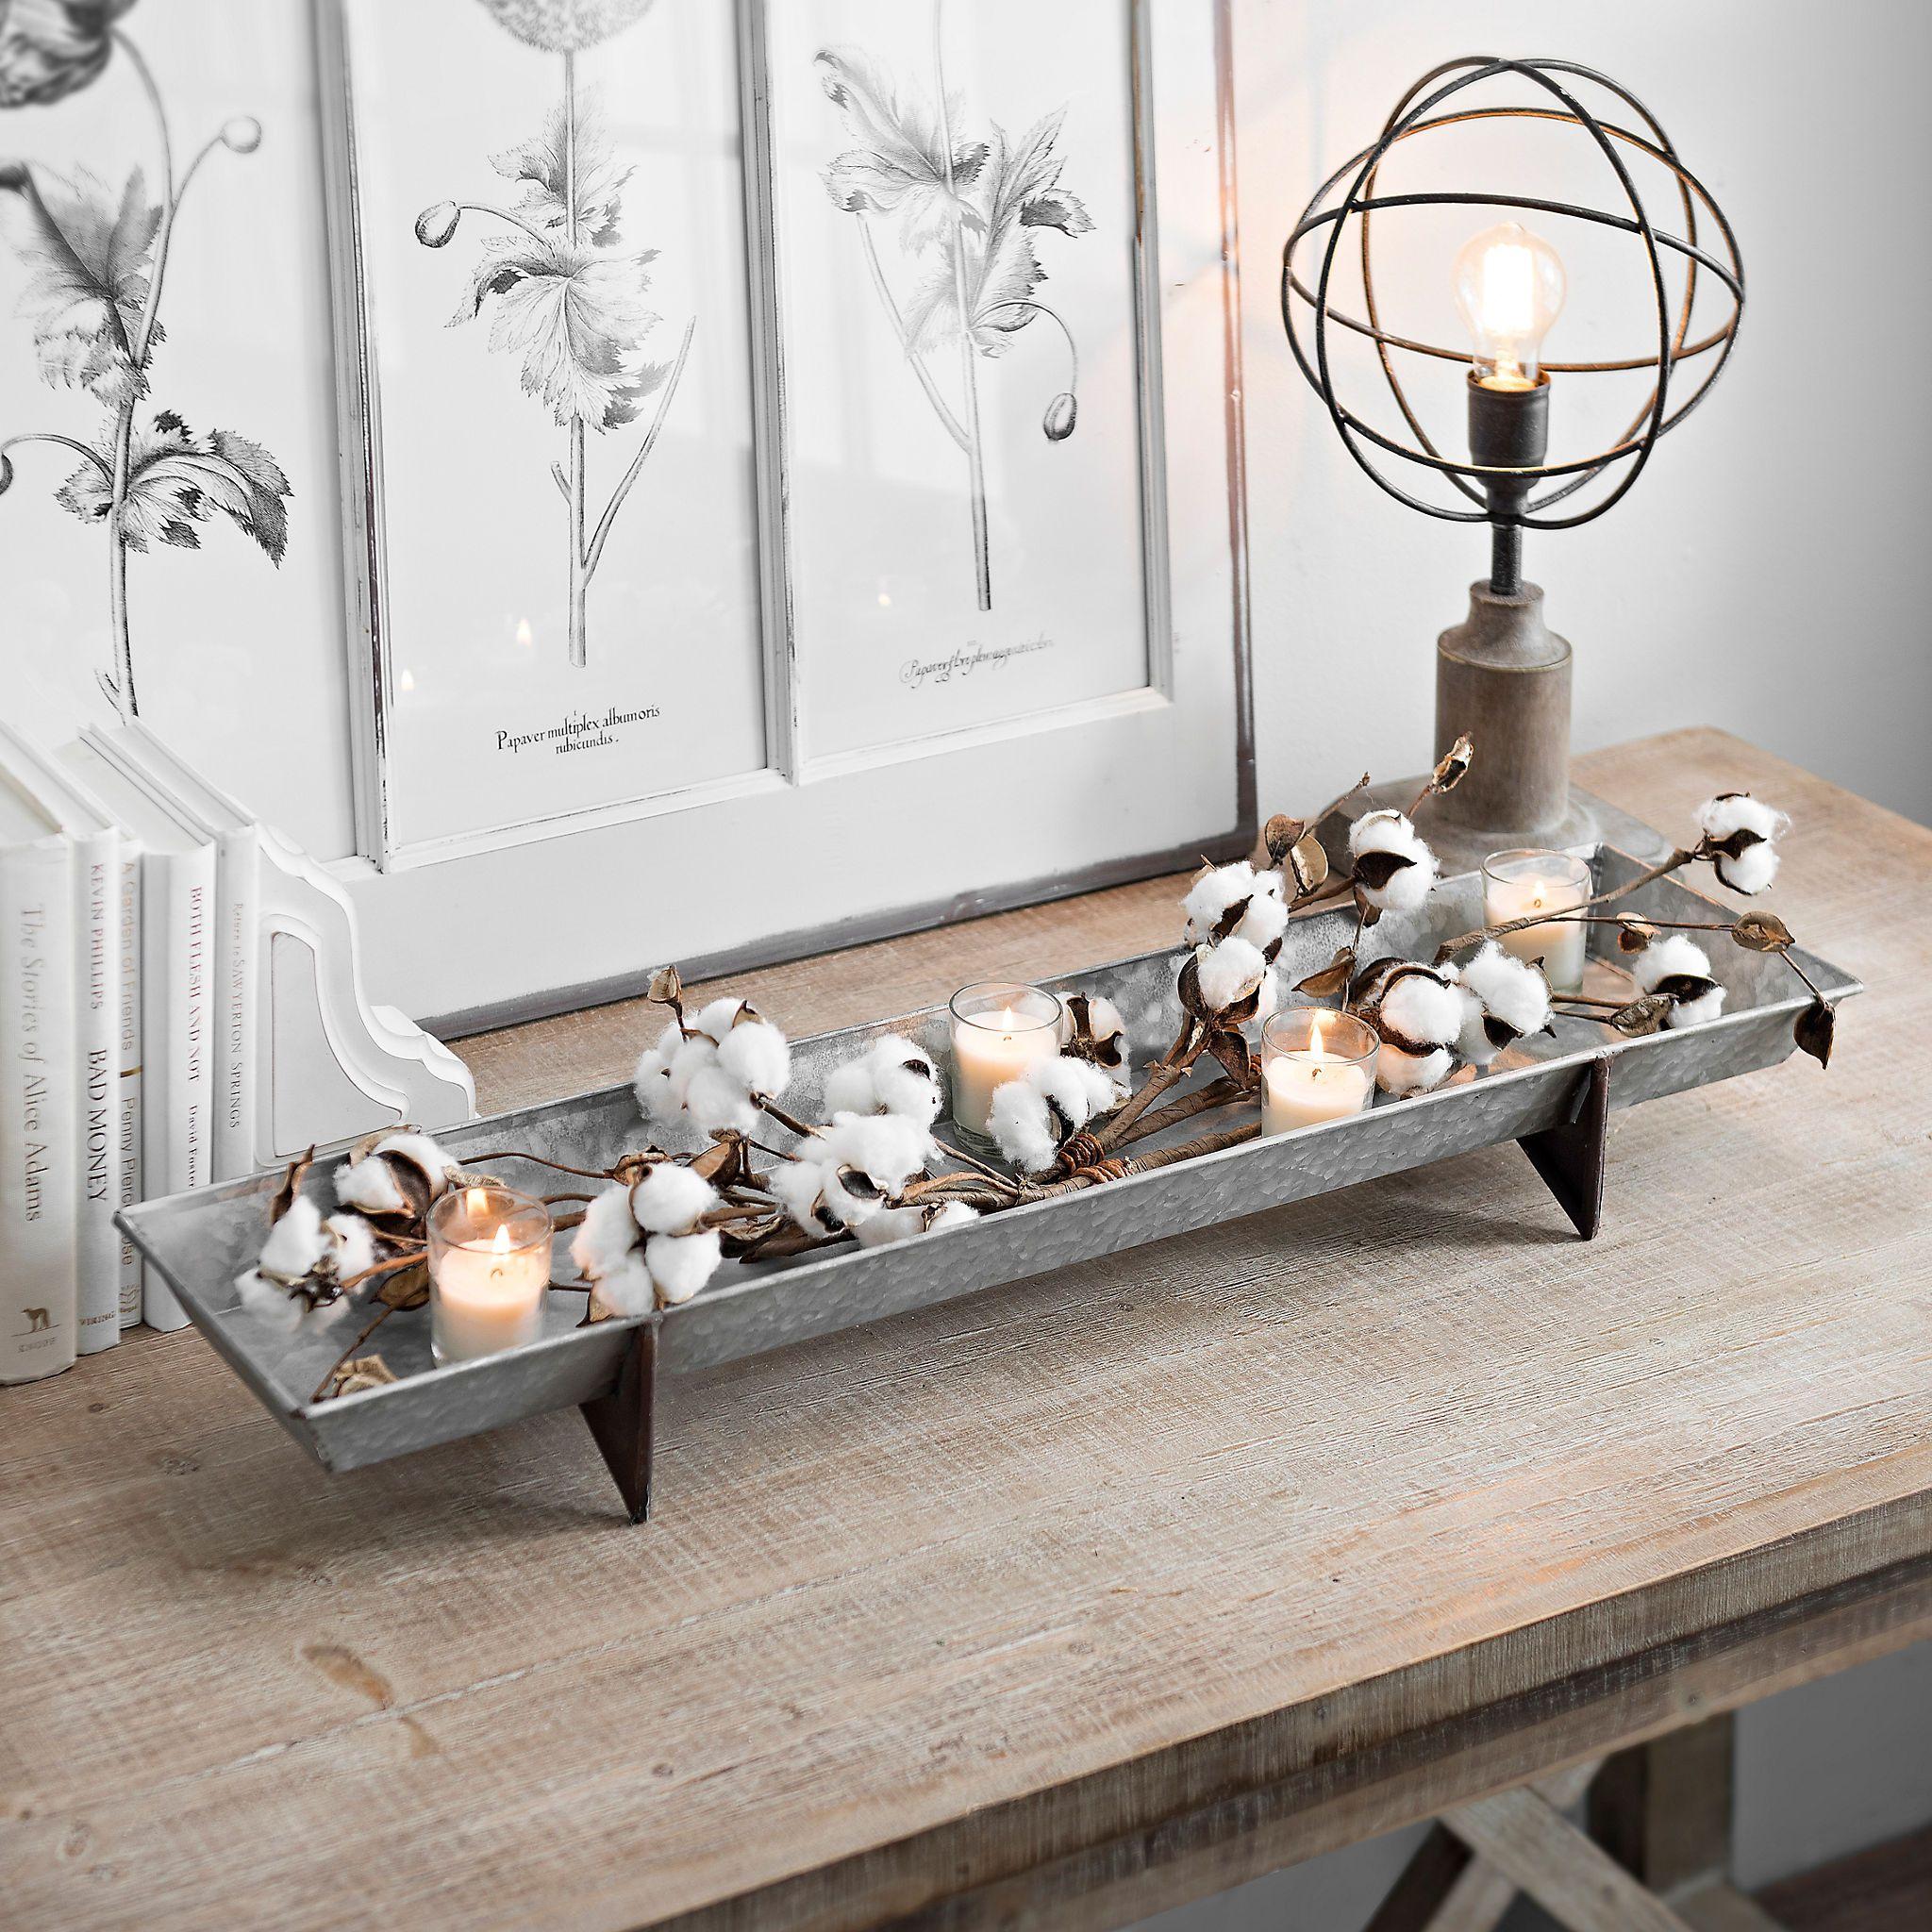 Long Galvanized Metal Decorative Tray | Decorative trays, Trays and ...